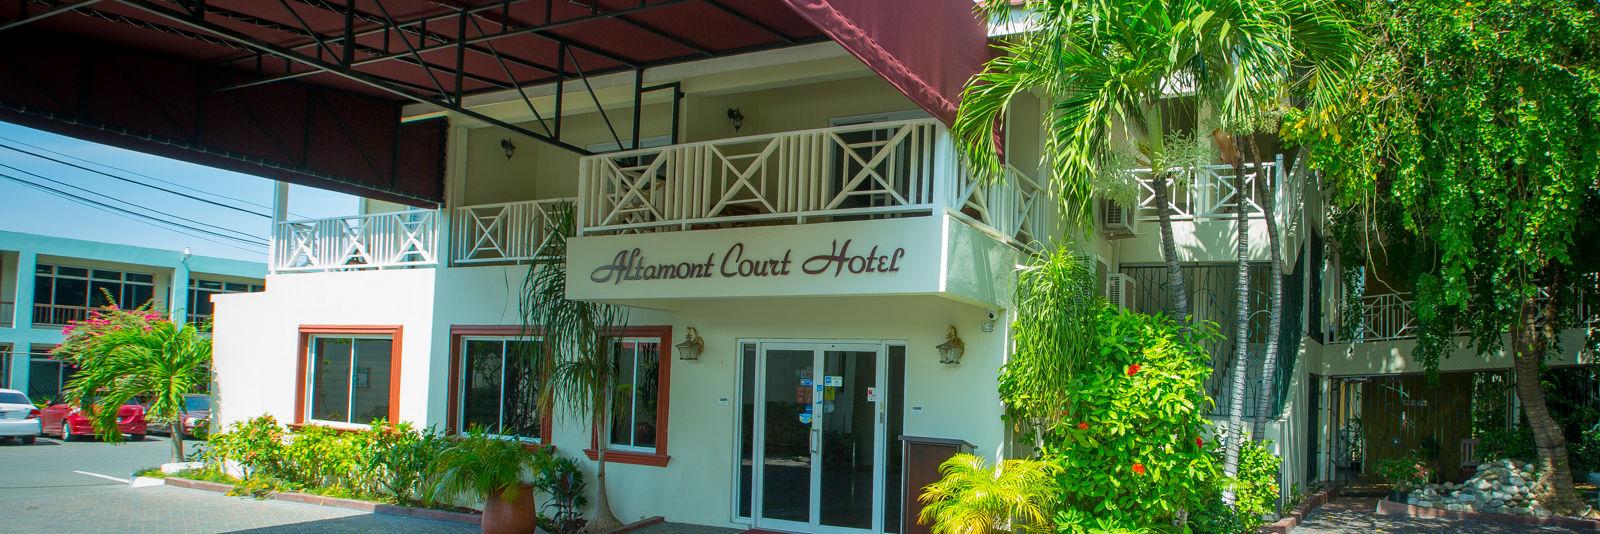 hotel port cocher 2 1